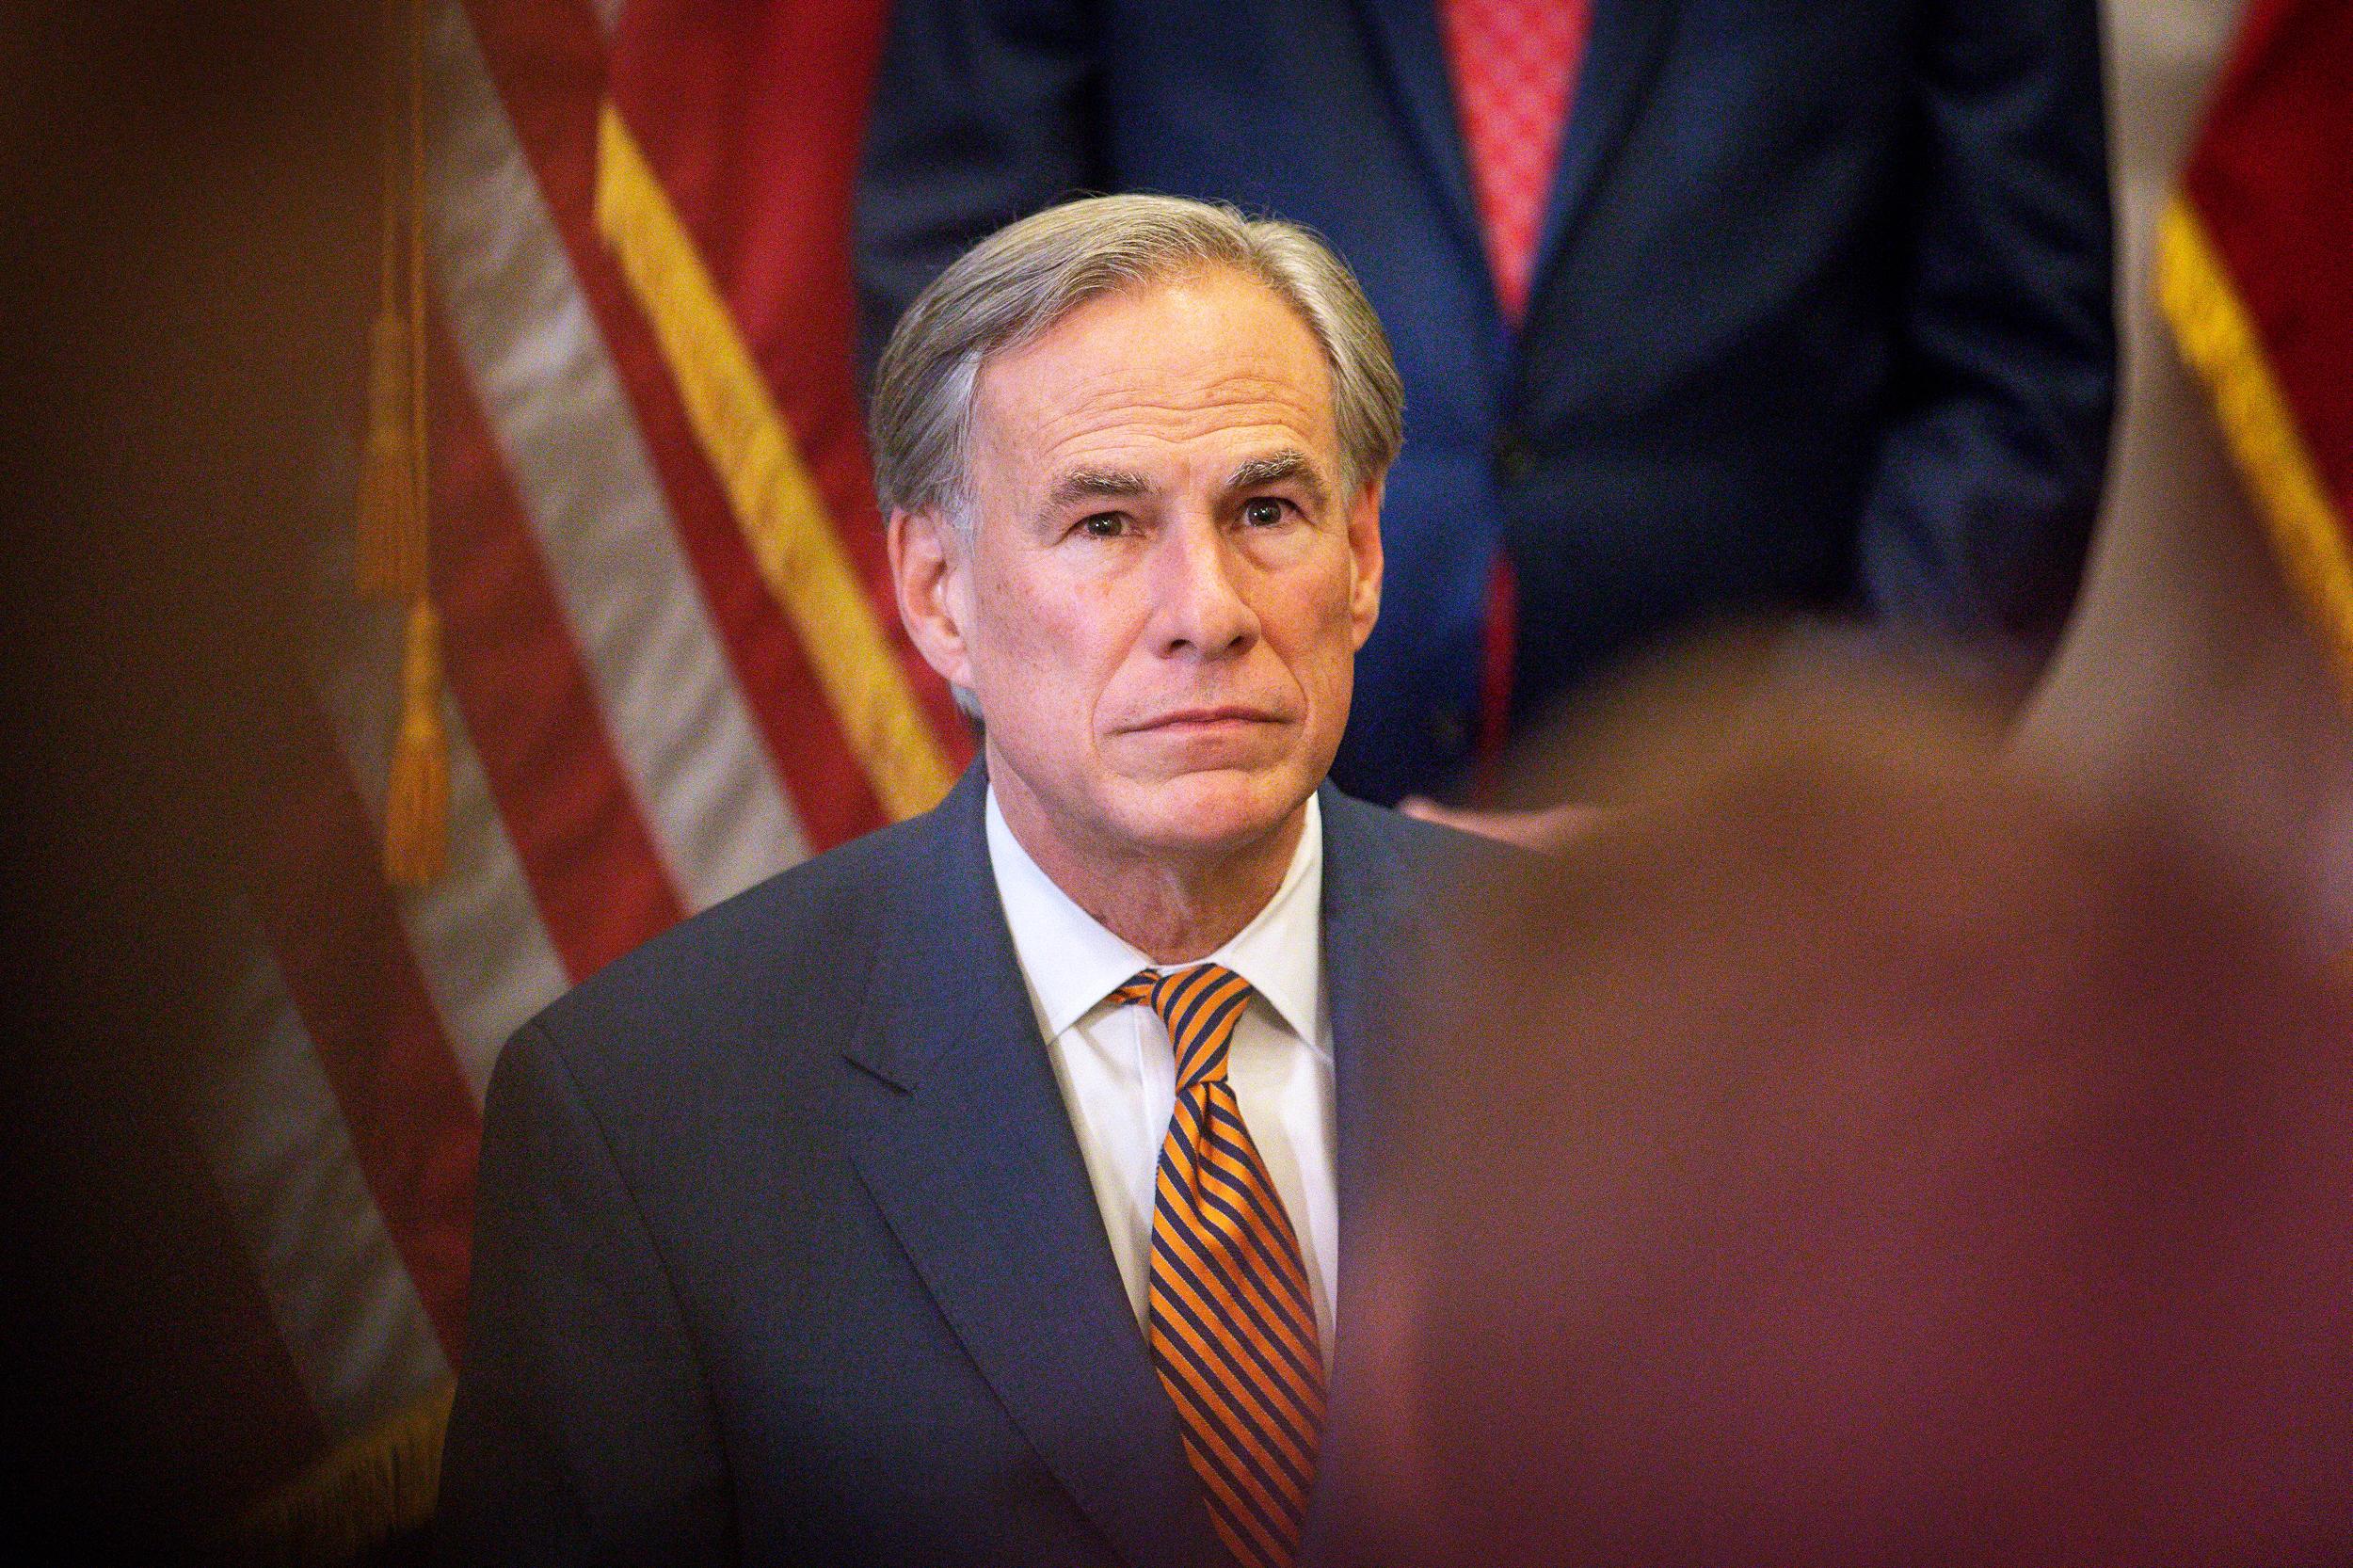 Texas Gov. Greg Abbott tests positive for Covid after banning mask, vaccination mandates